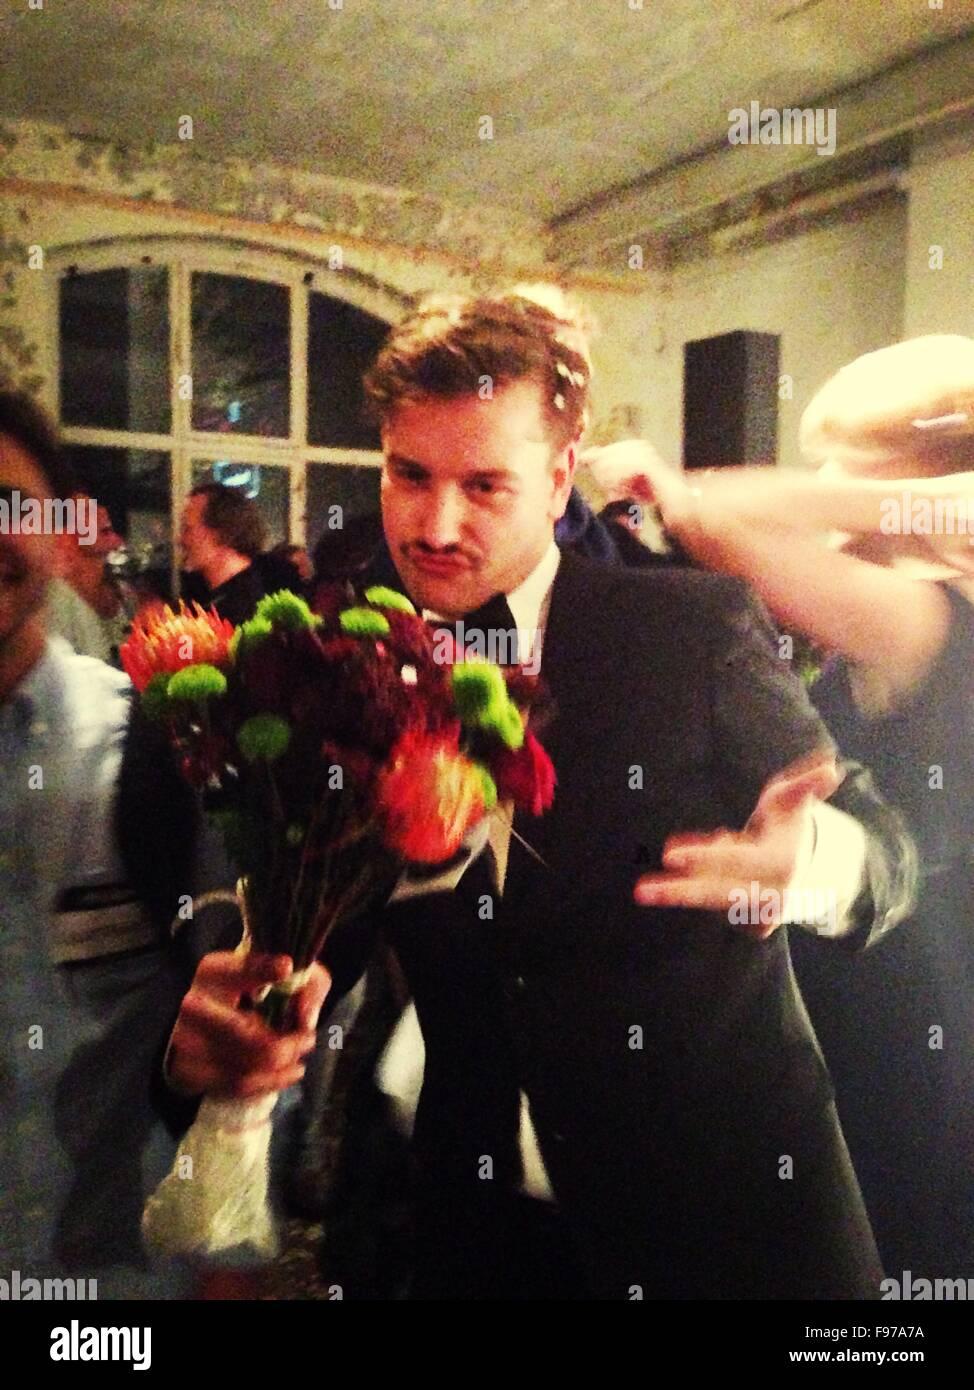 Junger Mann im Anzug Kräuseln der Lippen bei Veranstaltung mit gedrückter Bouquet Stockbild